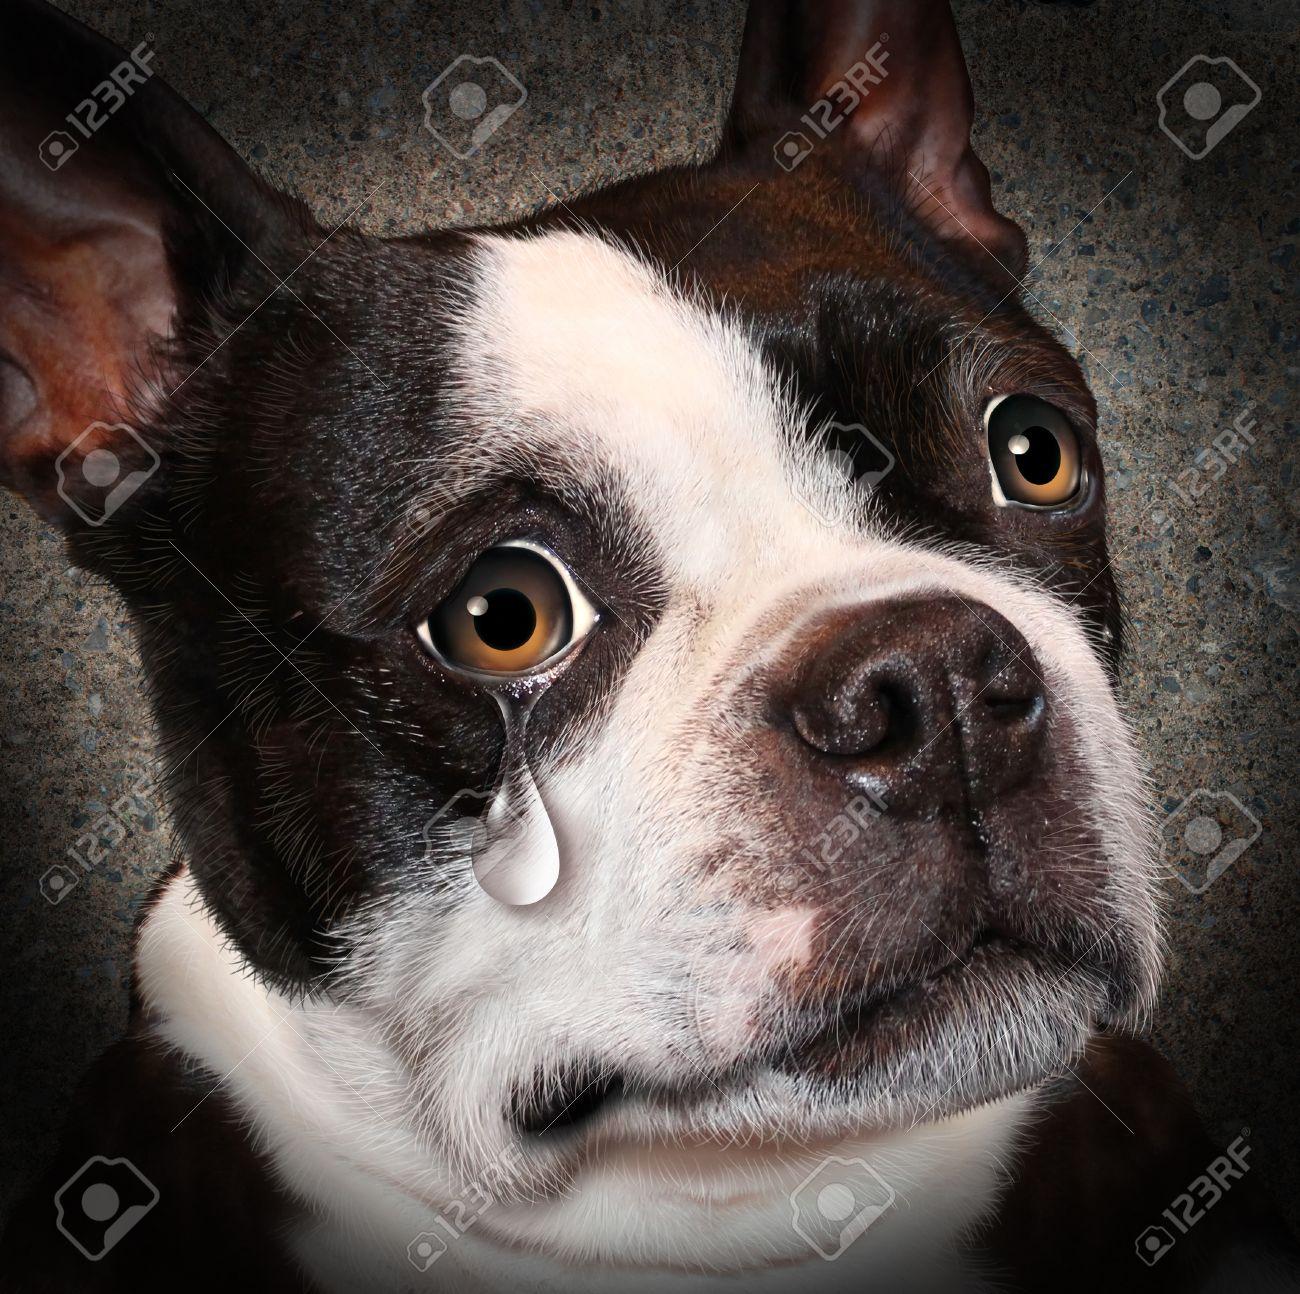 26171436-Lost-pet-animal-cruelty-and-neg